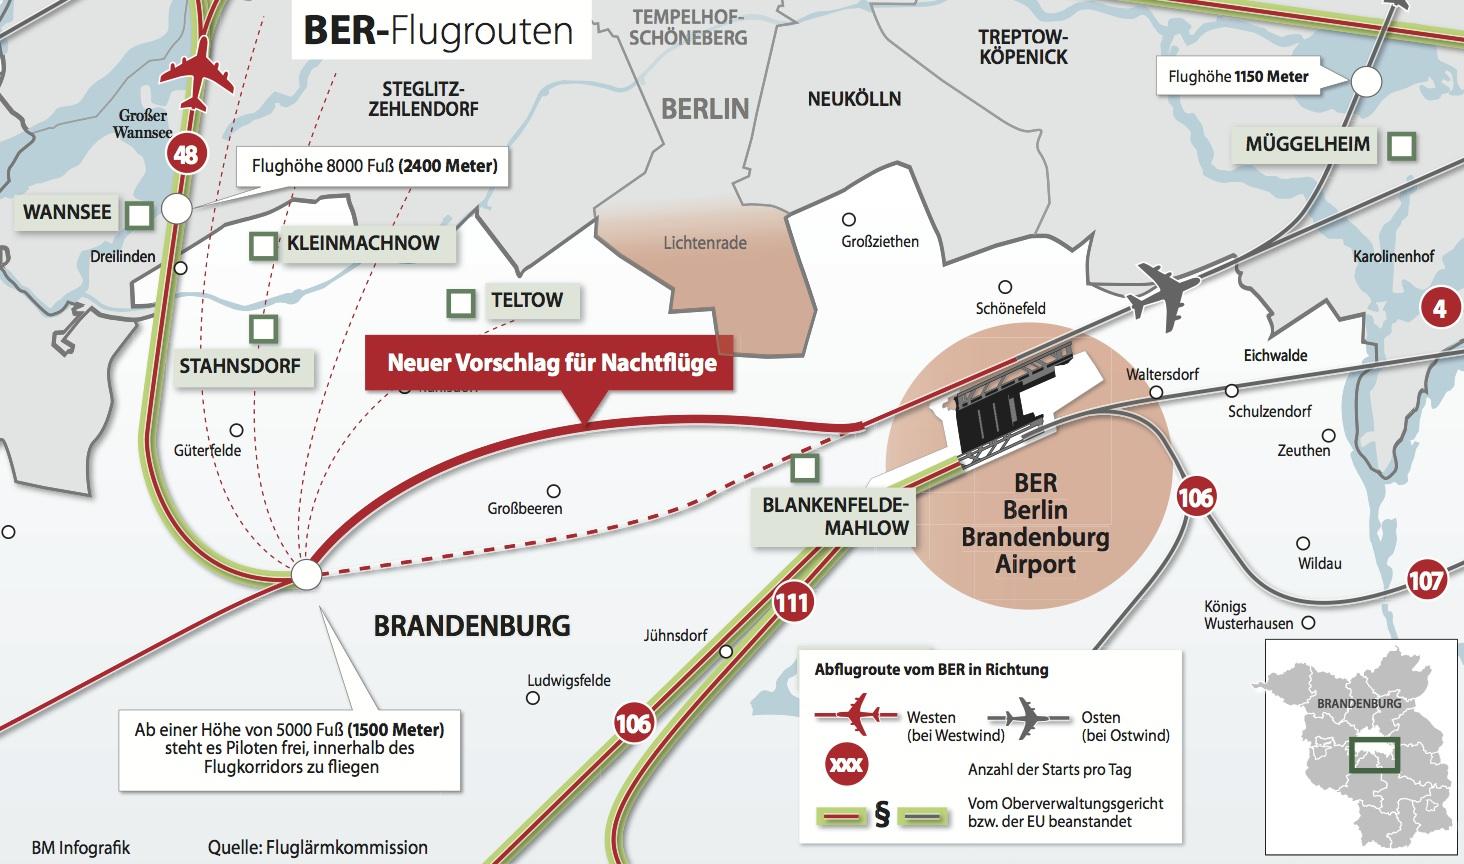 Karte Berlin Lichtenrade.Flugrouten Karte 940 Berlin Aktuell Berliner Morgenpost